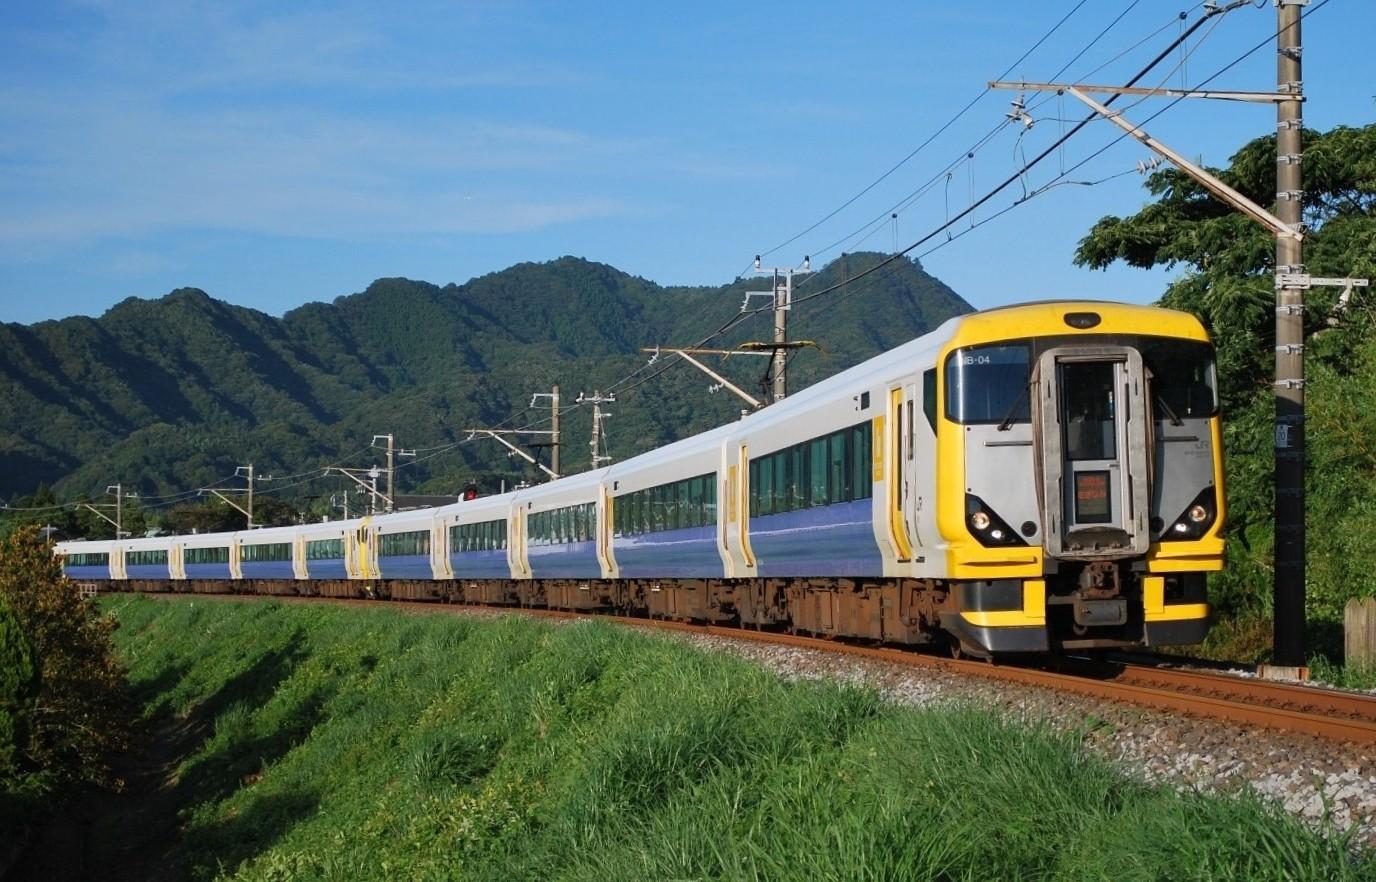 http://livedoor.blogimg.jp/h_nekomata/imgs/e/e/ee826dab.jpg